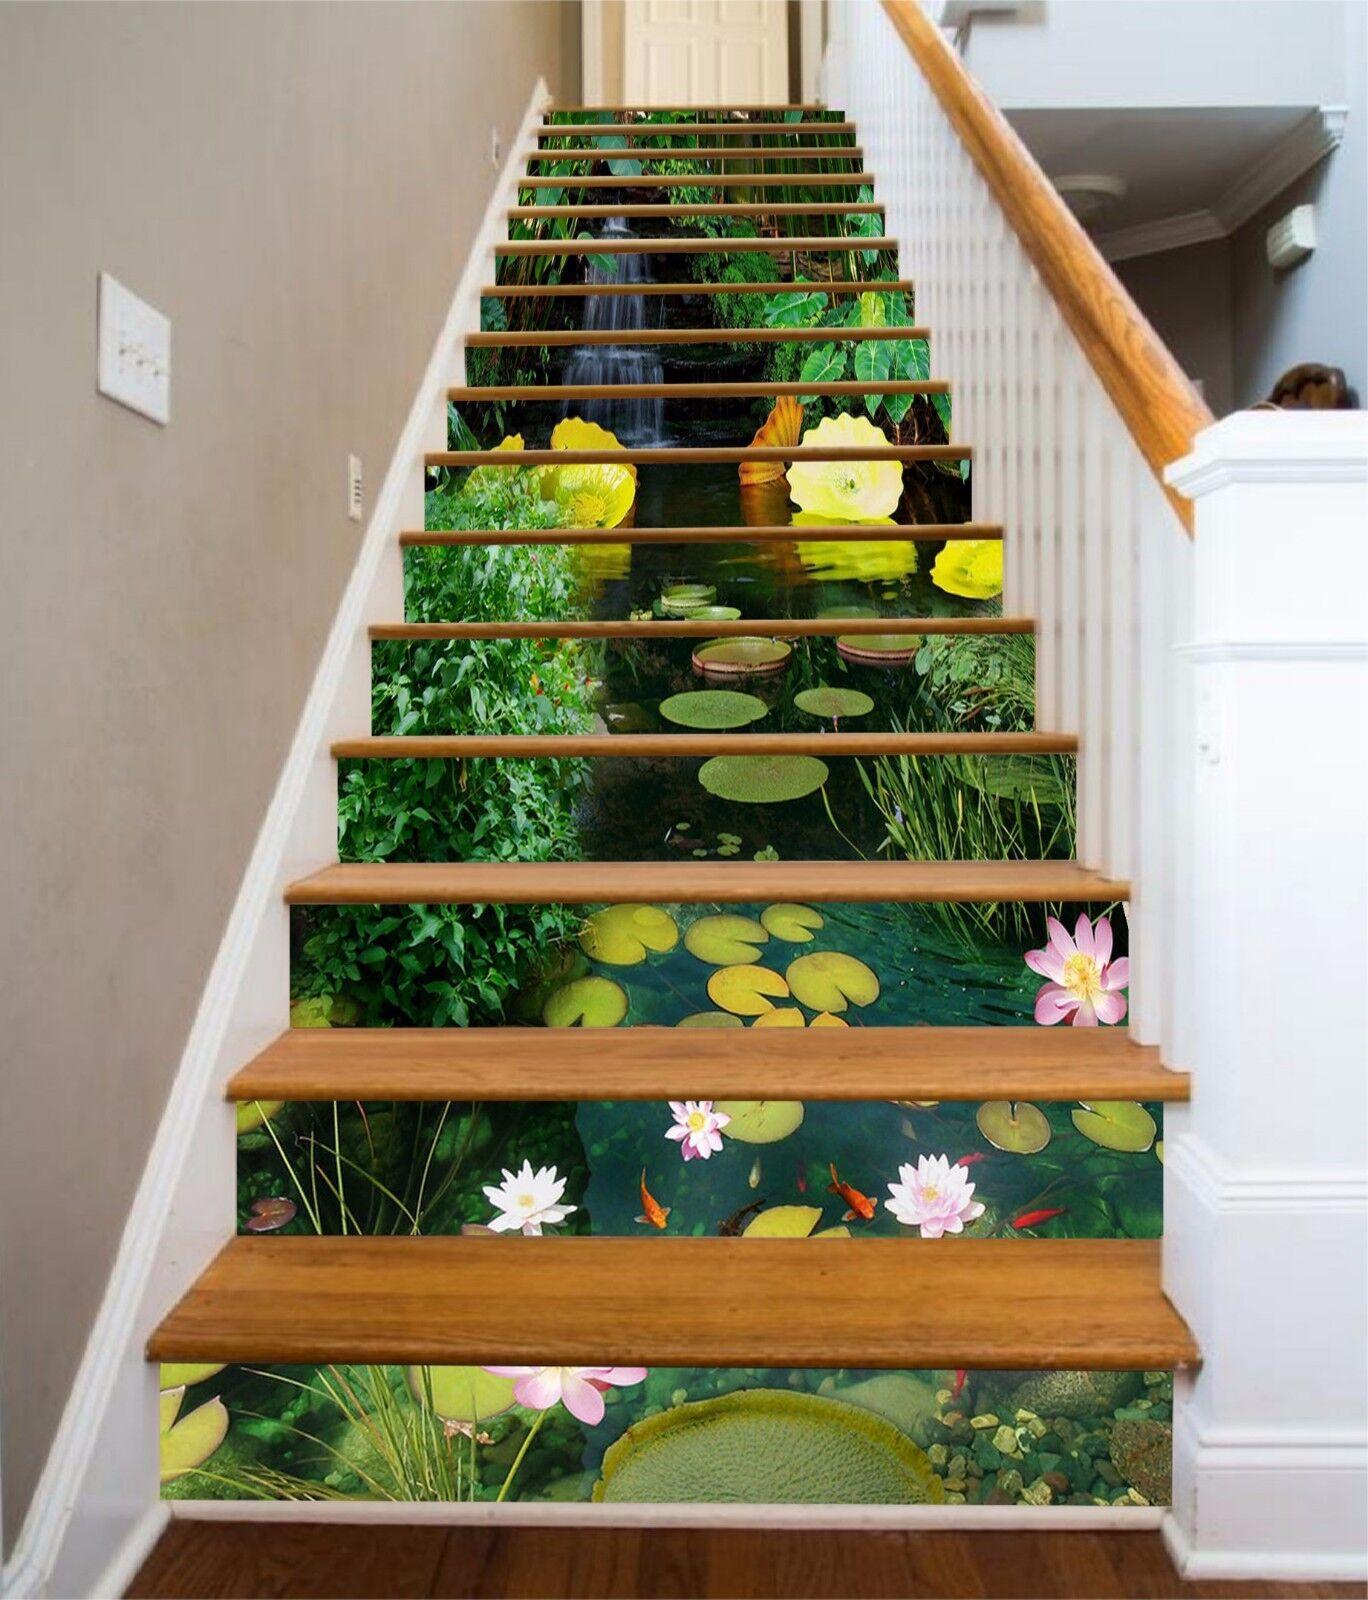 3D Pond lotus leaf Stair Risers Decoration Photo Mural Vinyl Decal Wallpaper AU